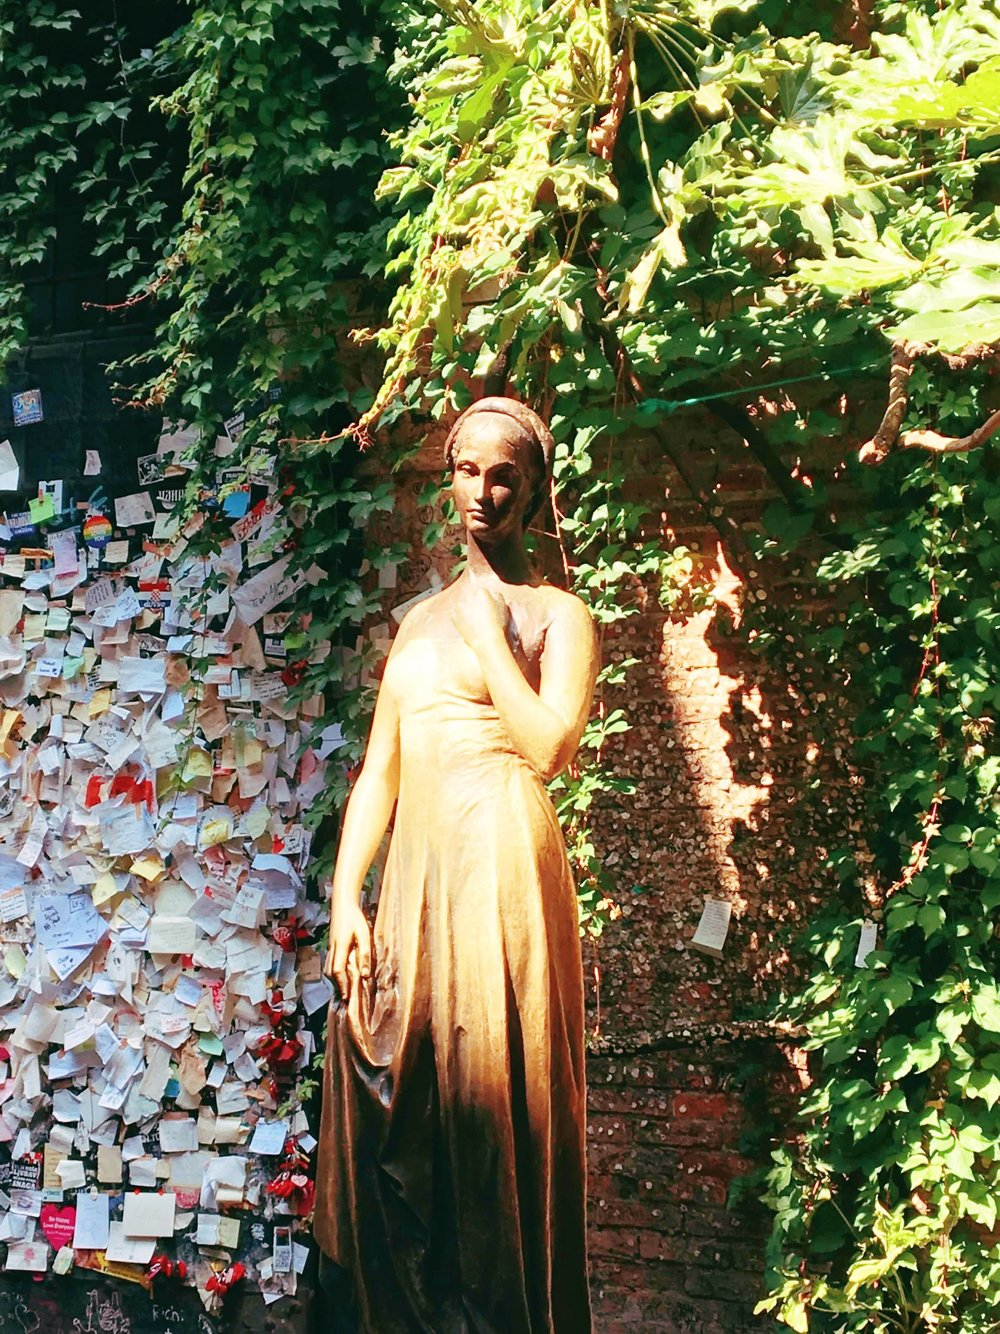 Visiting Verona | Juliette | jumpseatjenny | Verona Italy.jpg